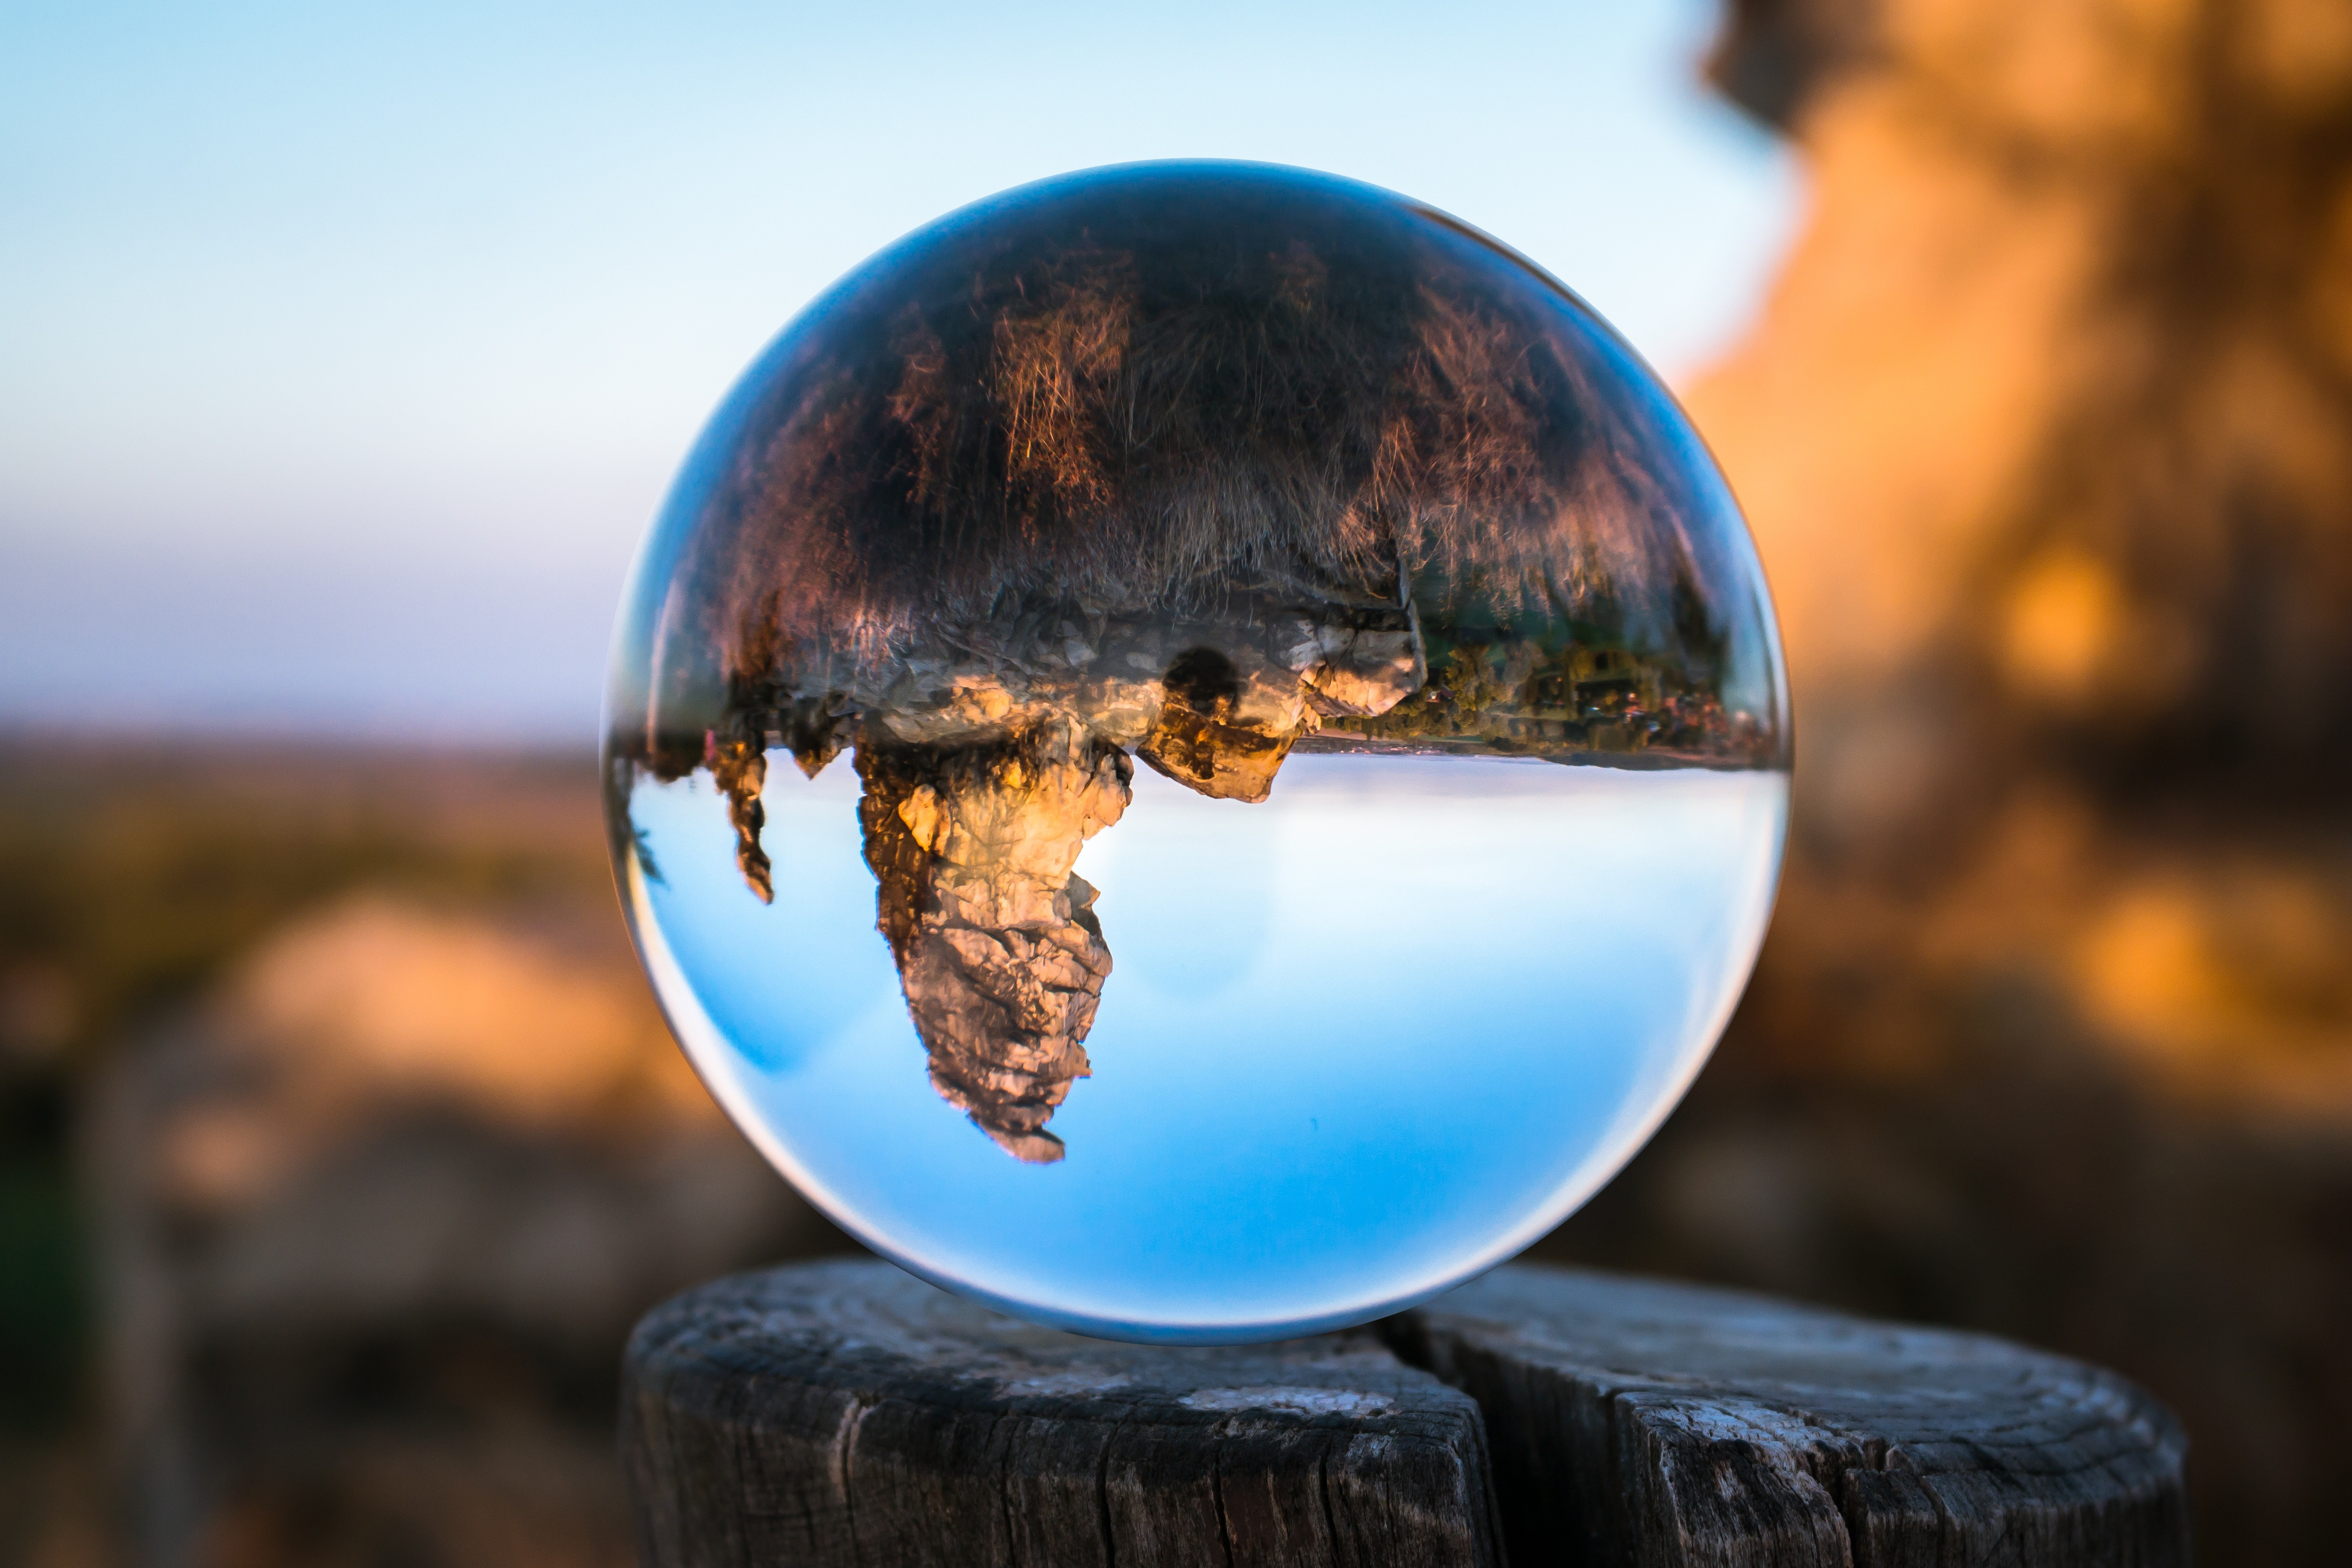 ball-ball-shaped-blur-269057